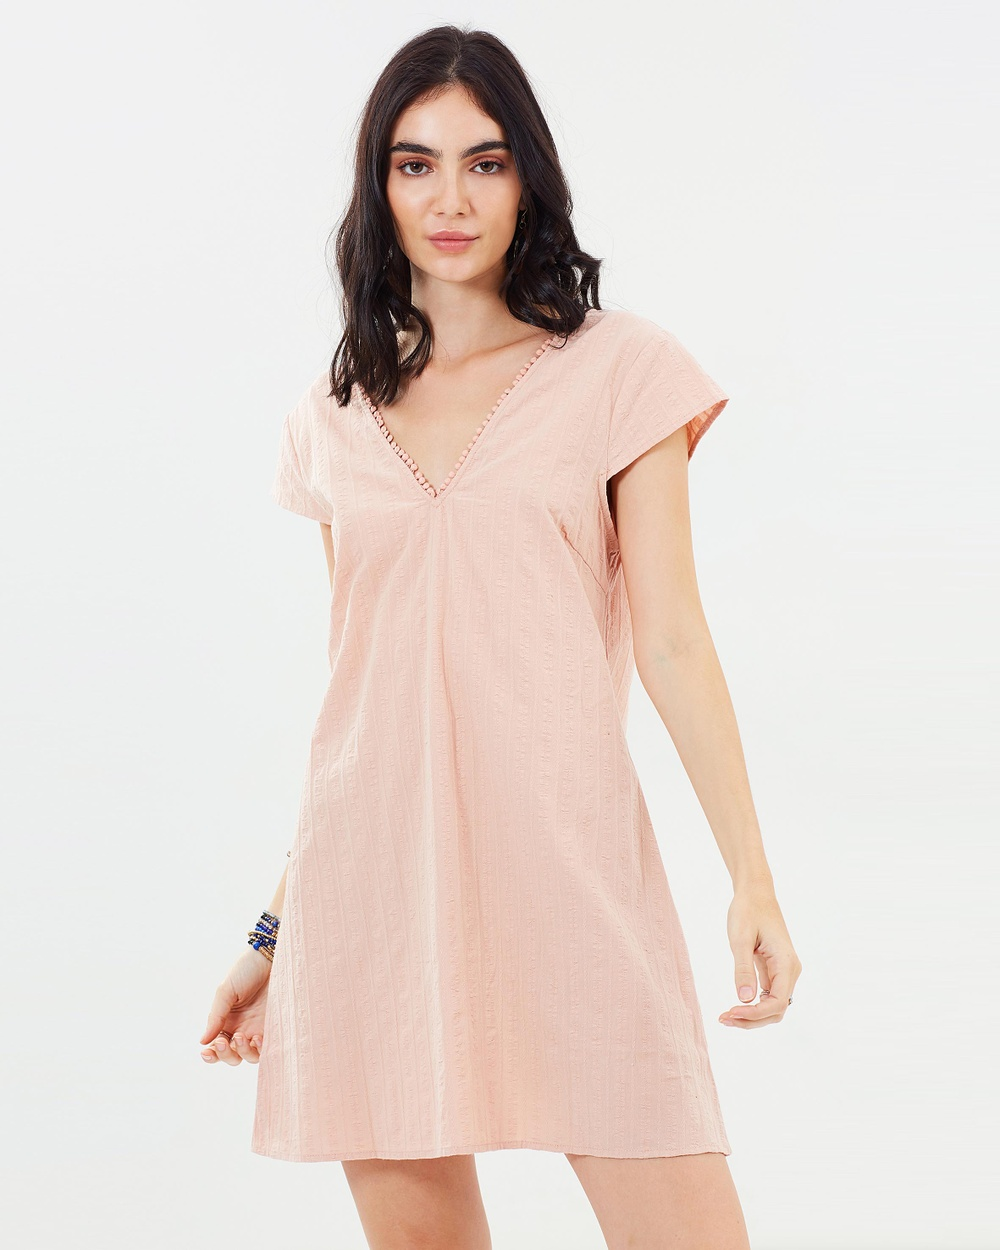 Dazie Bliss V Neck Shift Dress Dresses Pink Bliss V-Neck Shift Dress